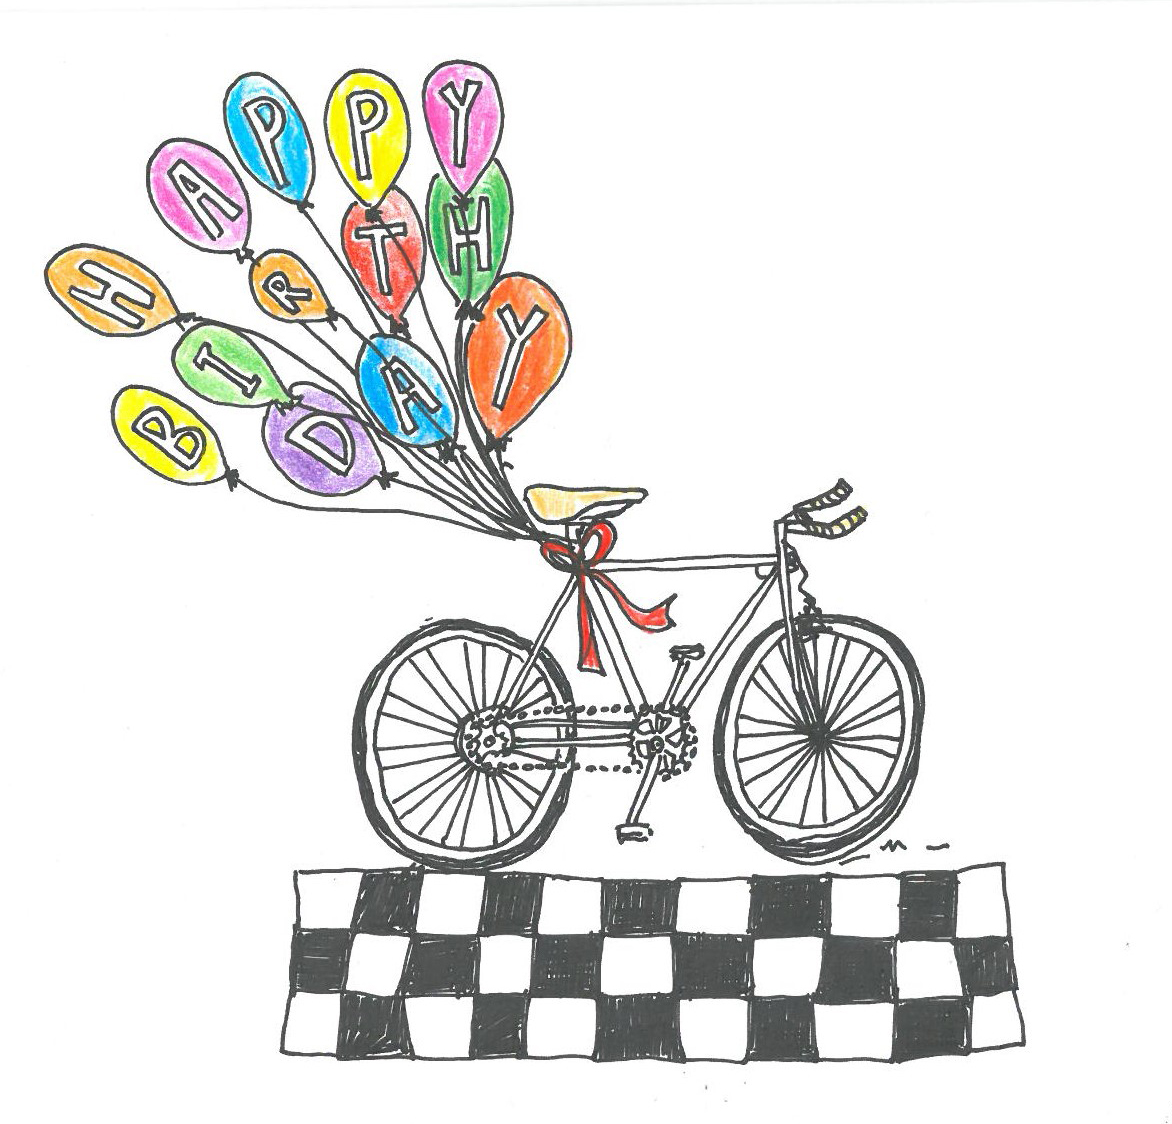 Birthday bike and balloons